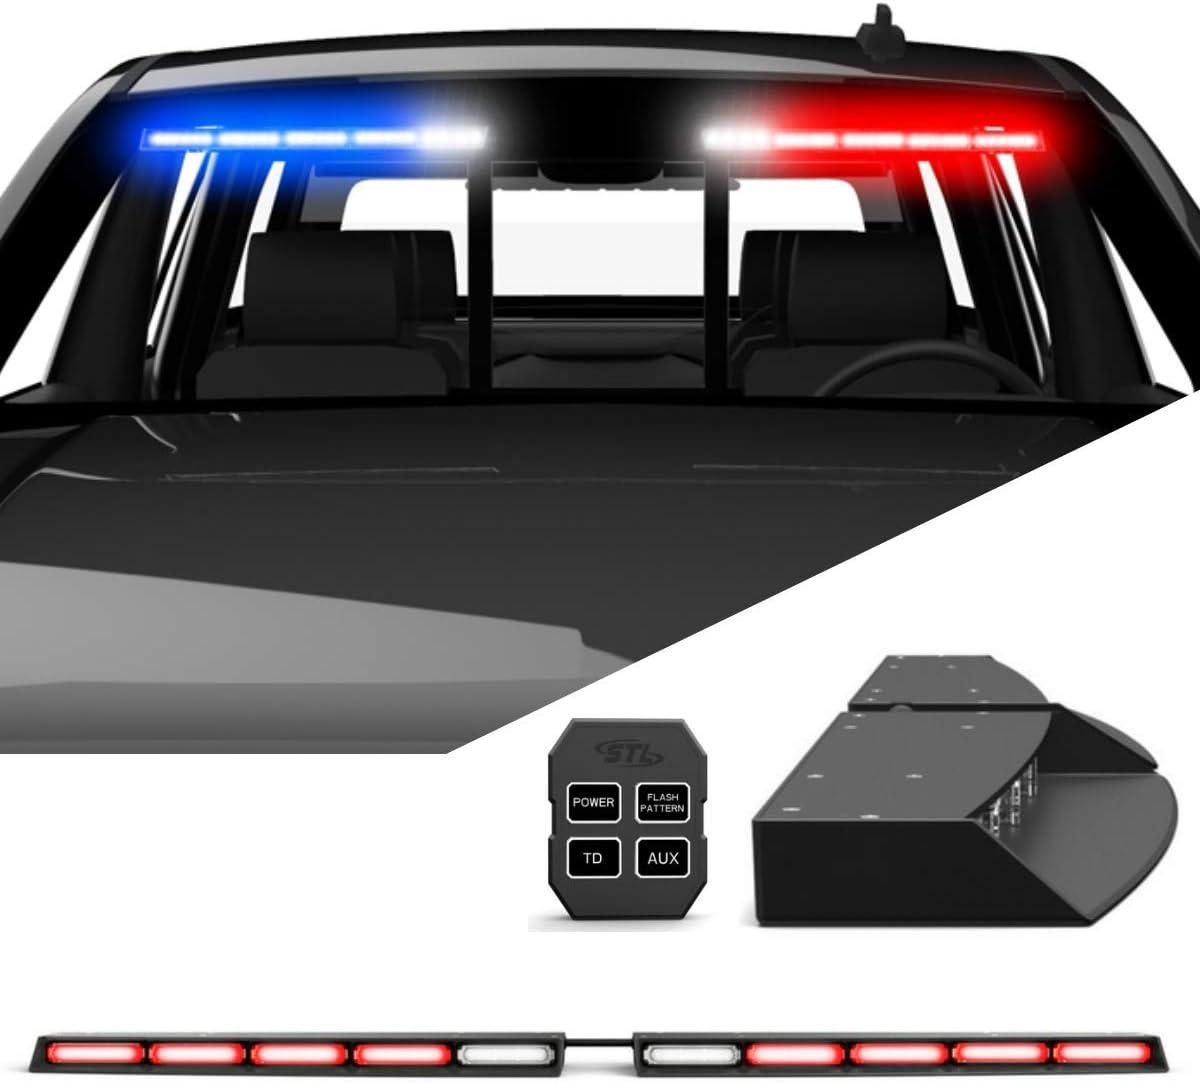 SpeedTech Lights Raptor TIR Upper SALENEW very popular! Interior LED Windshield Split Direct sale of manufacturer